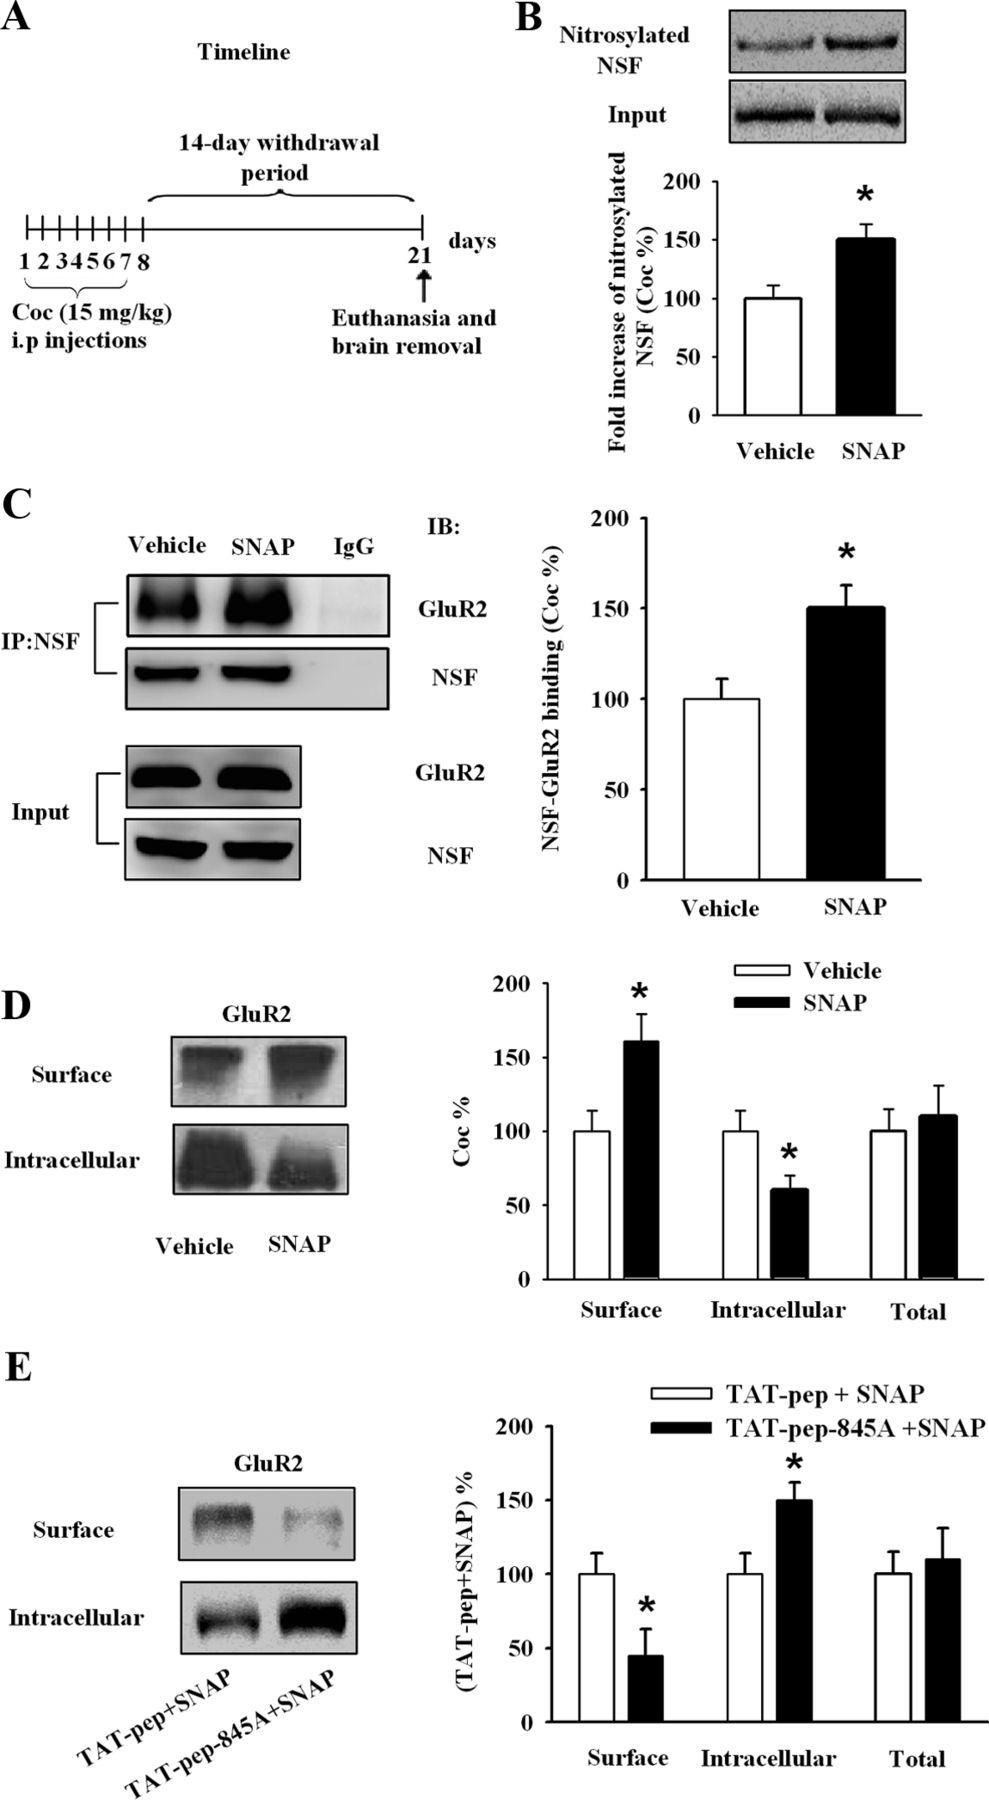 Interactions between N-Ethylmaleimide-Sensitive Factor and GluR2 in